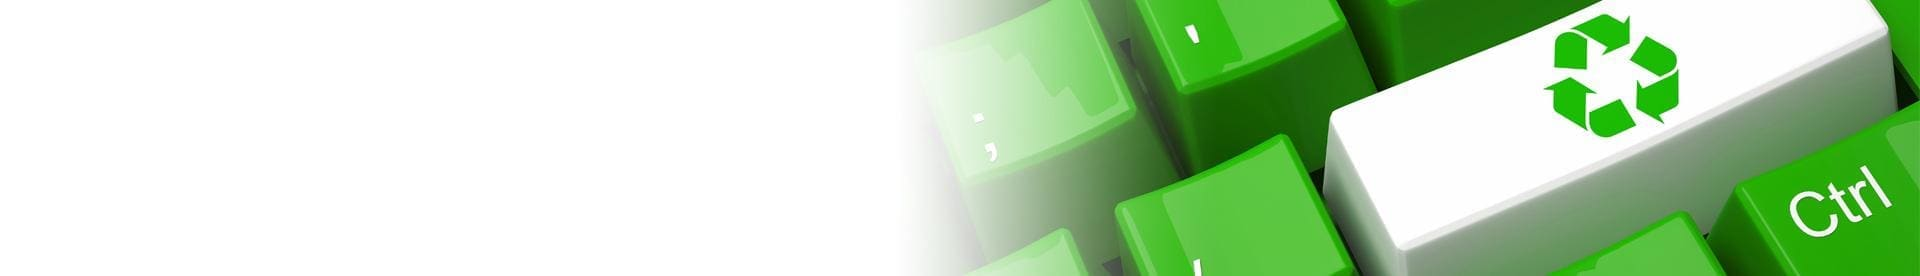 Wtórplast Recykling - Banner - Ekologiczna klawiatura